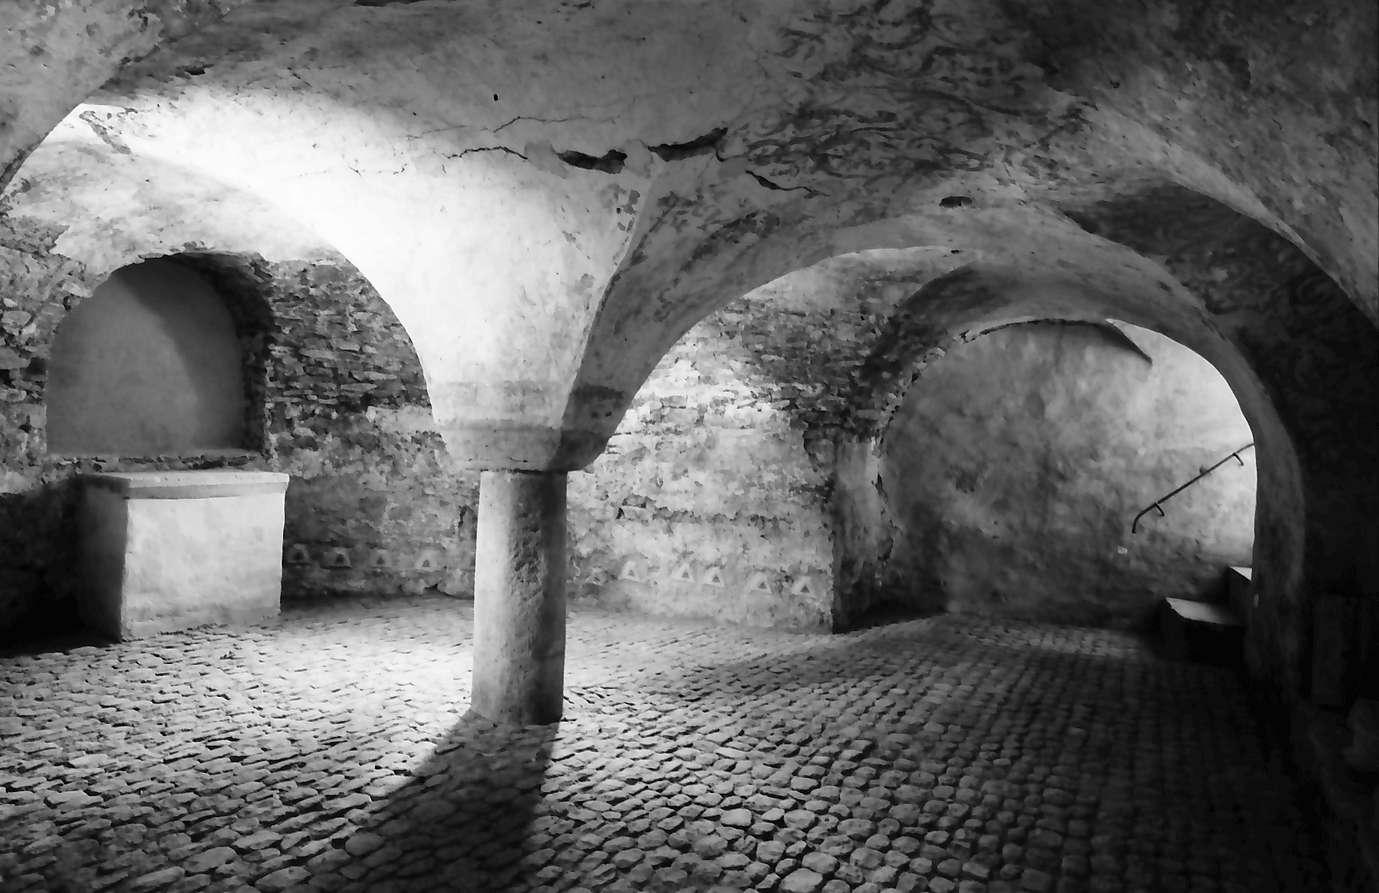 Sulzburg: Krypta, Bild 1